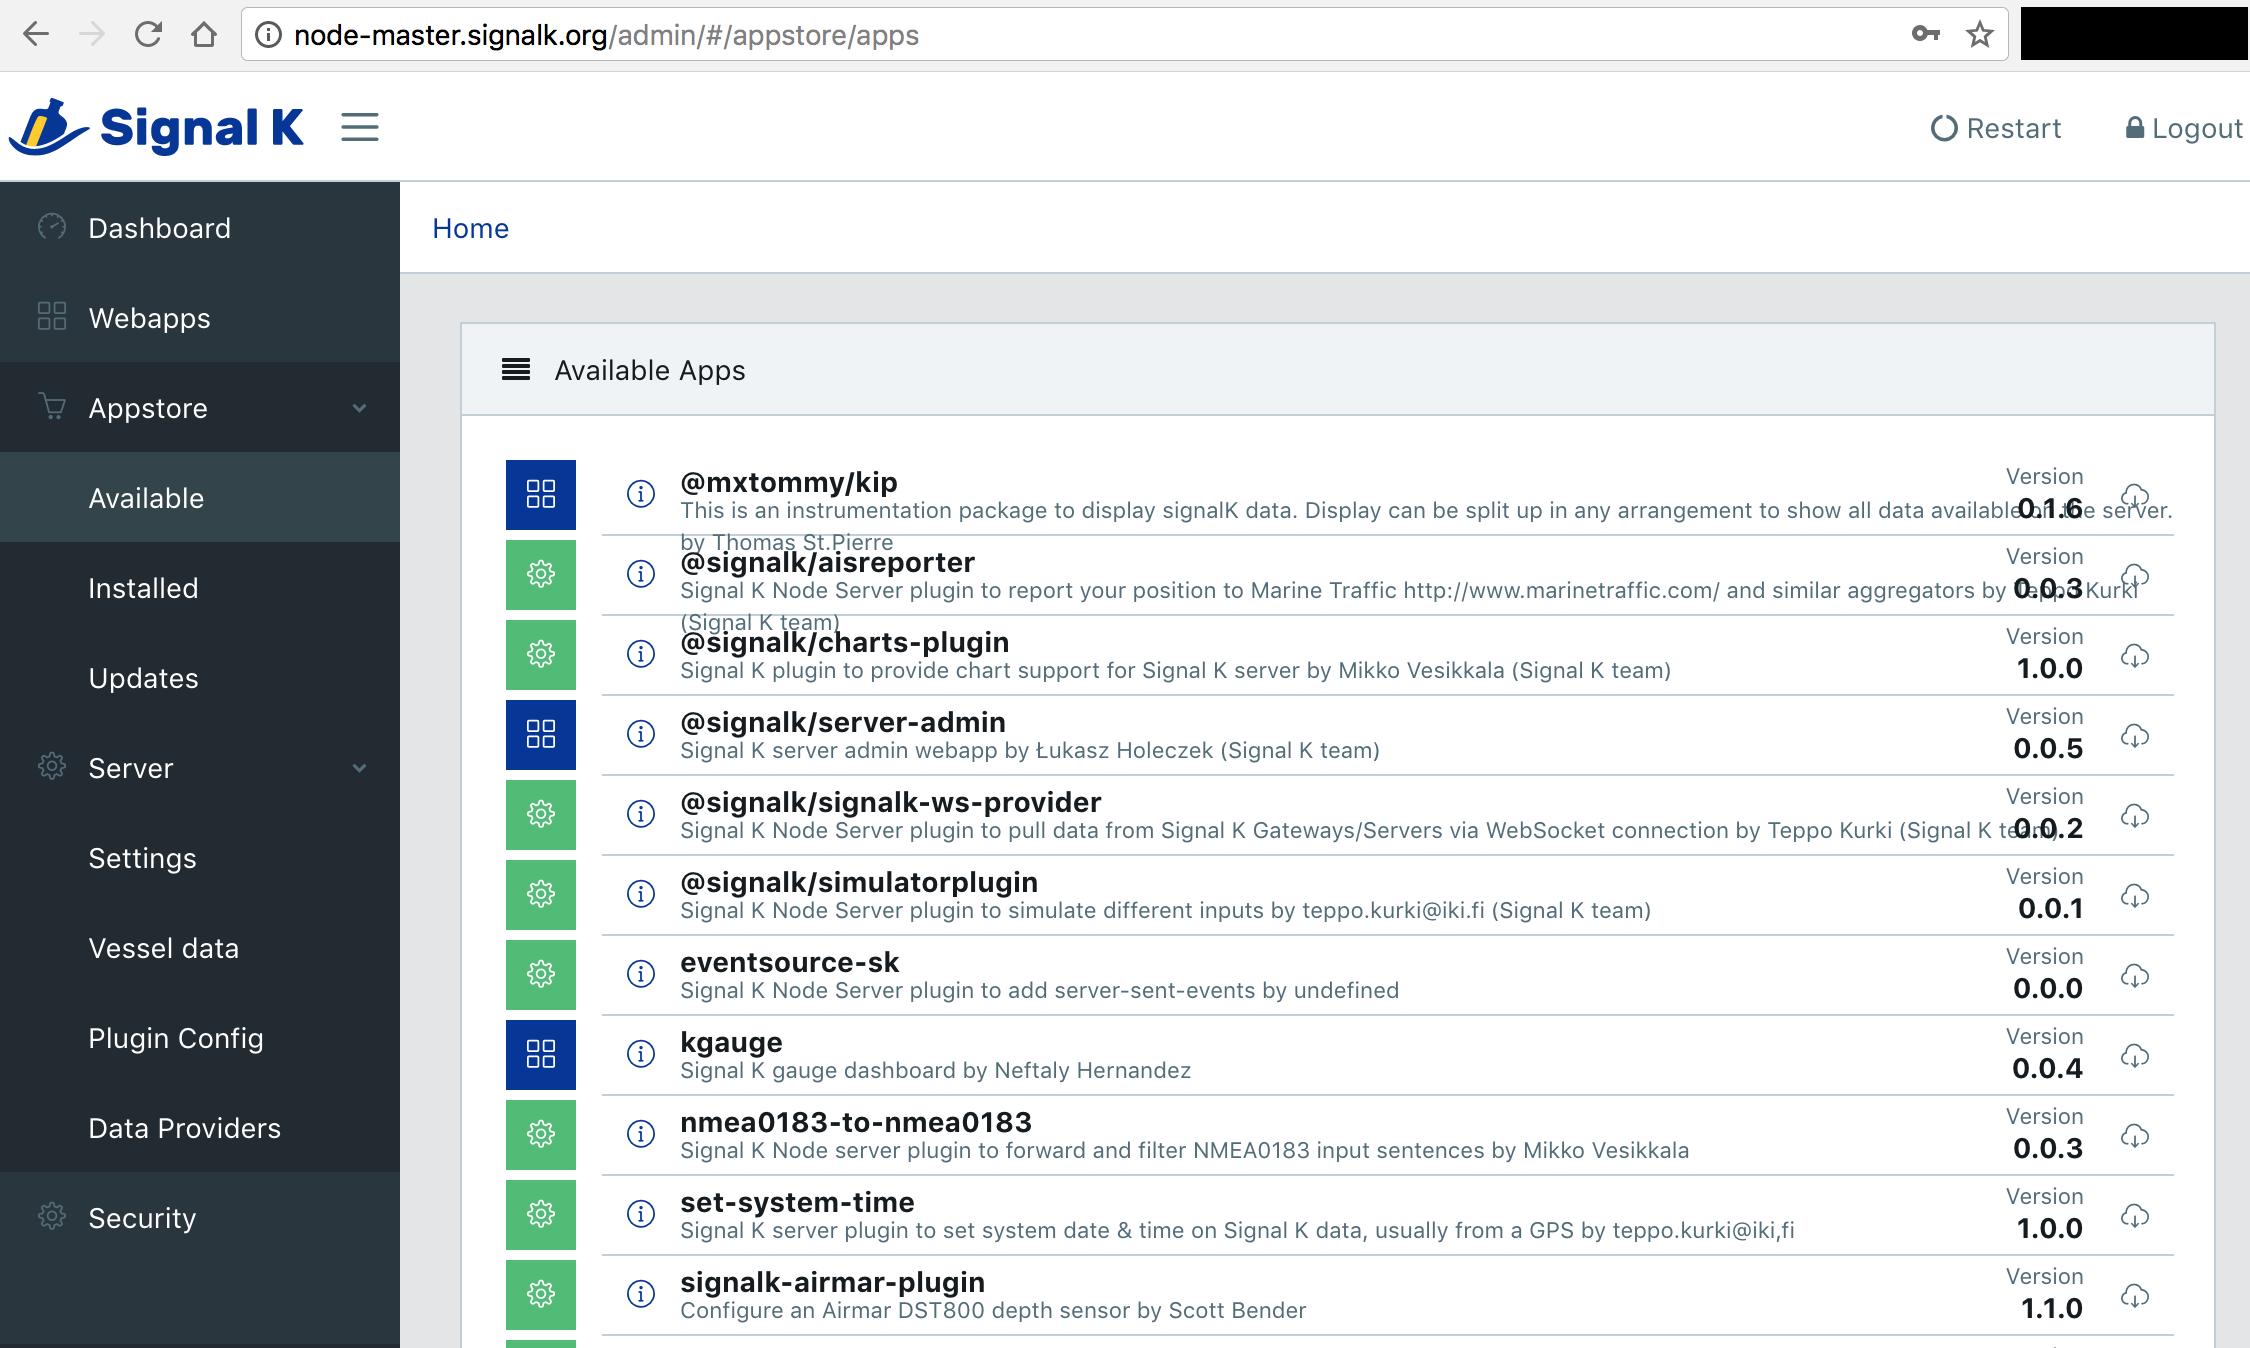 signalk-server-node/SERVERPLUGINS md at master · SignalK